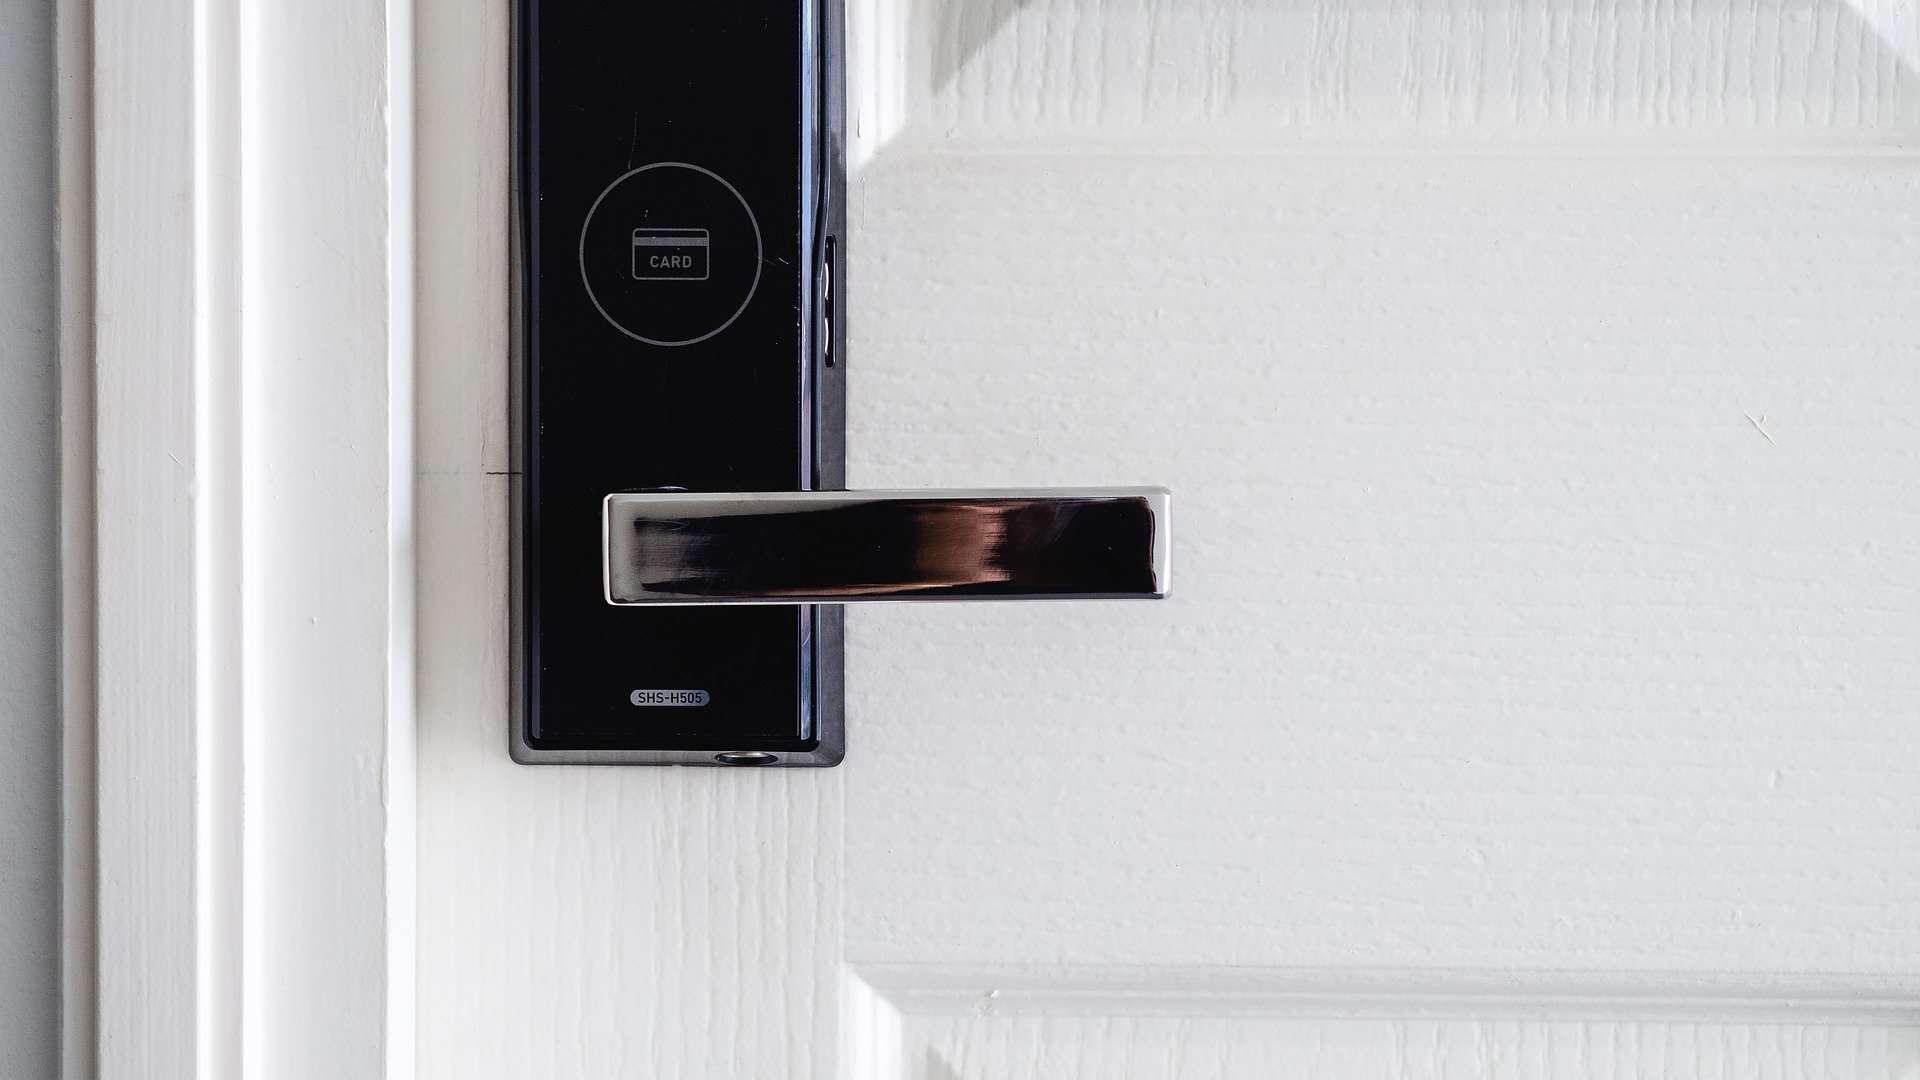 Types of Smart Door Locks For Homes & Offices in Nigeria